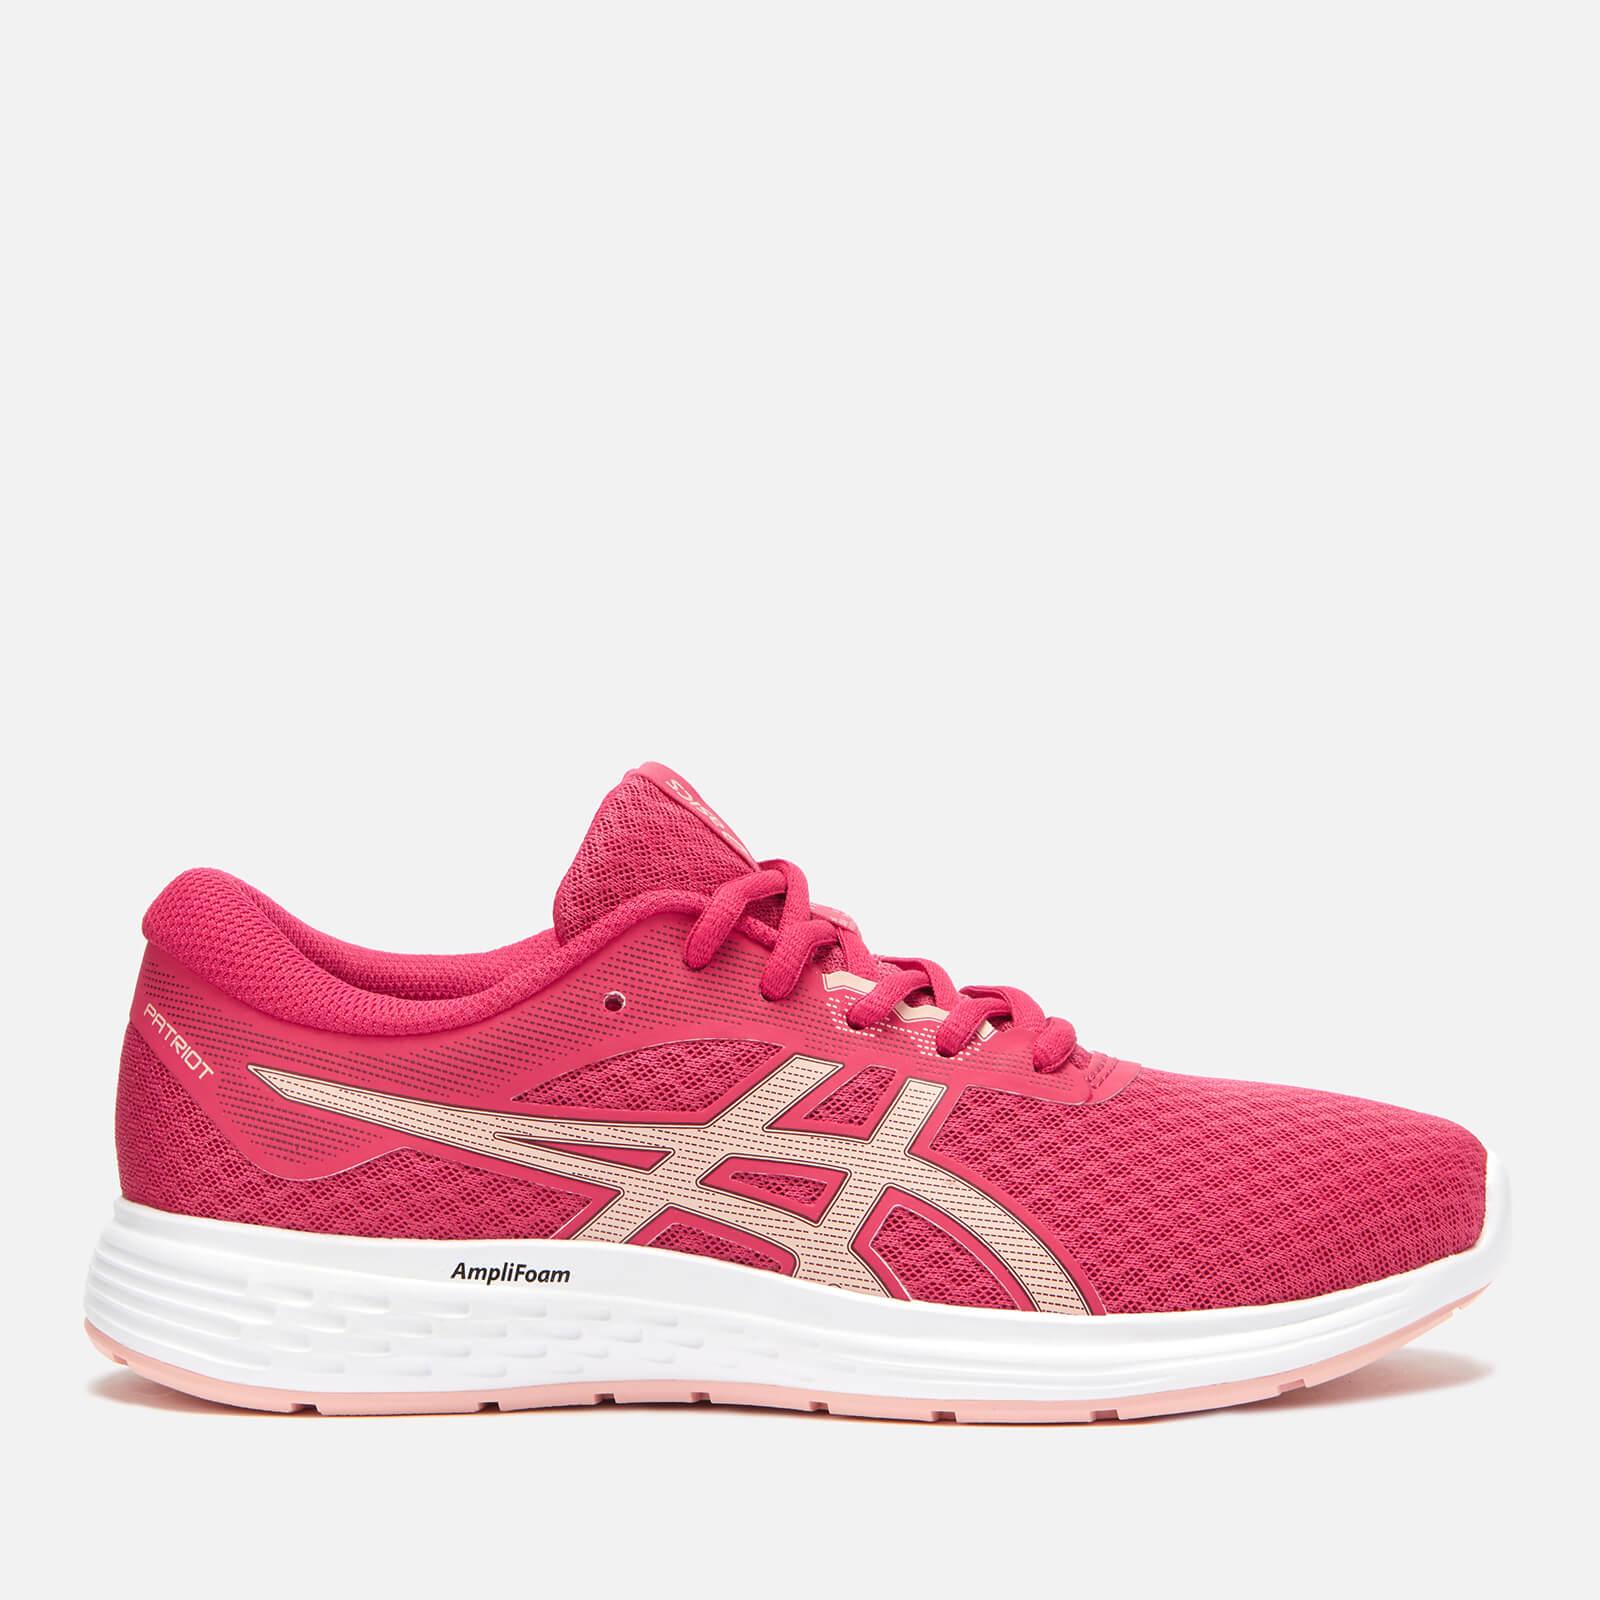 Asics Women's Running Patriot 11 Trainers - Rose Petal/Breeze - UK 7 - Pink